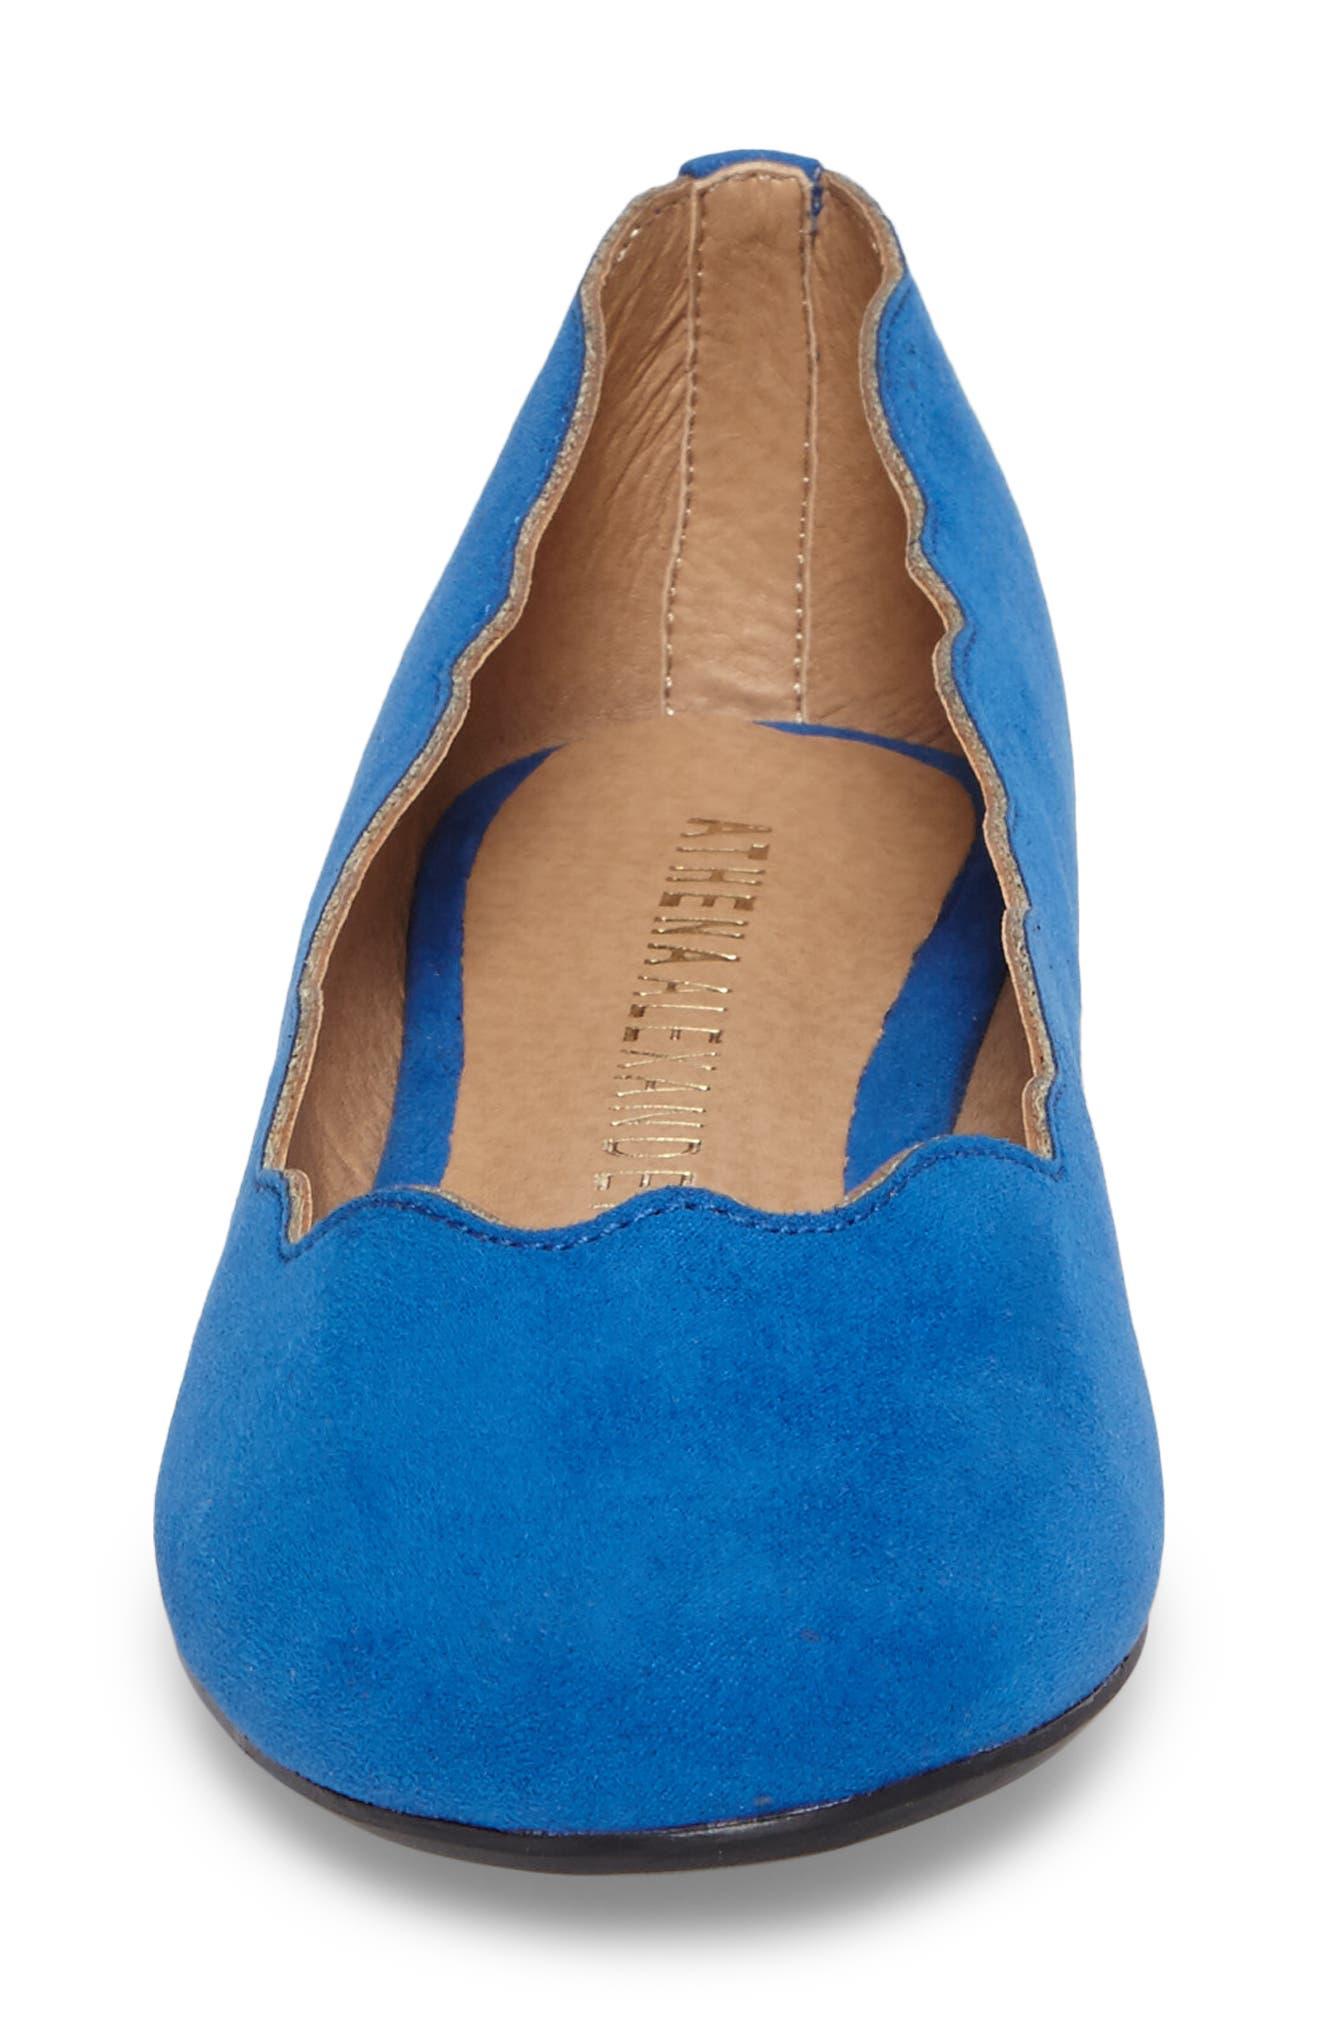 Tallye Ballet Flat,                             Alternate thumbnail 4, color,                             Royal Blue Faux Suede